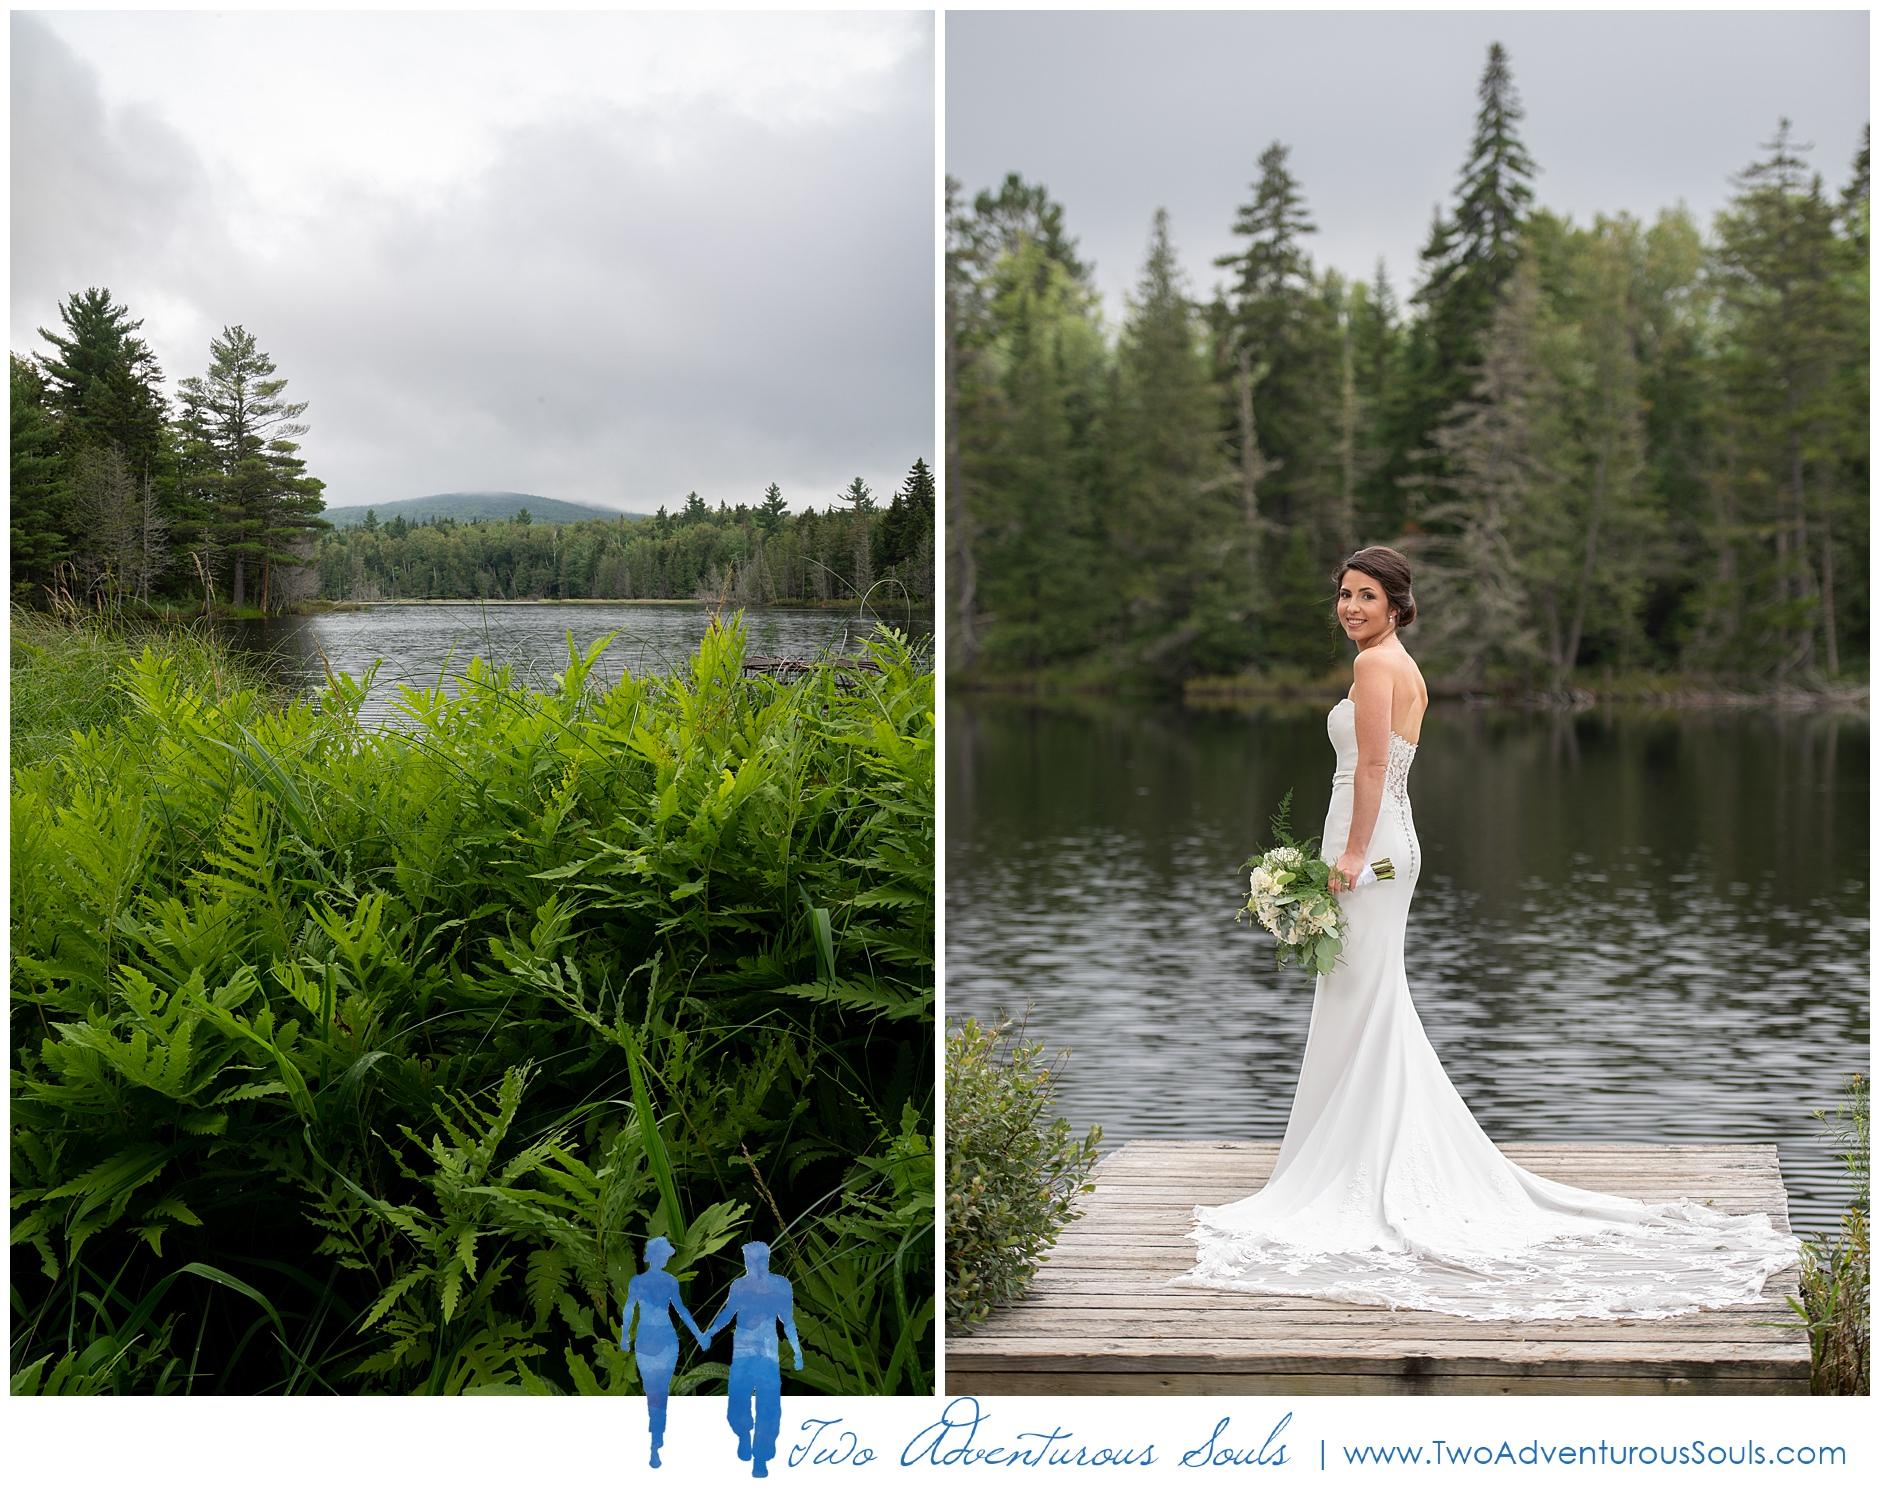 Sugarloaf Outdoor Center Wedding Photographers, Destination Wedding Photographers, Two Adventurous Souls-081719_0047.jpg